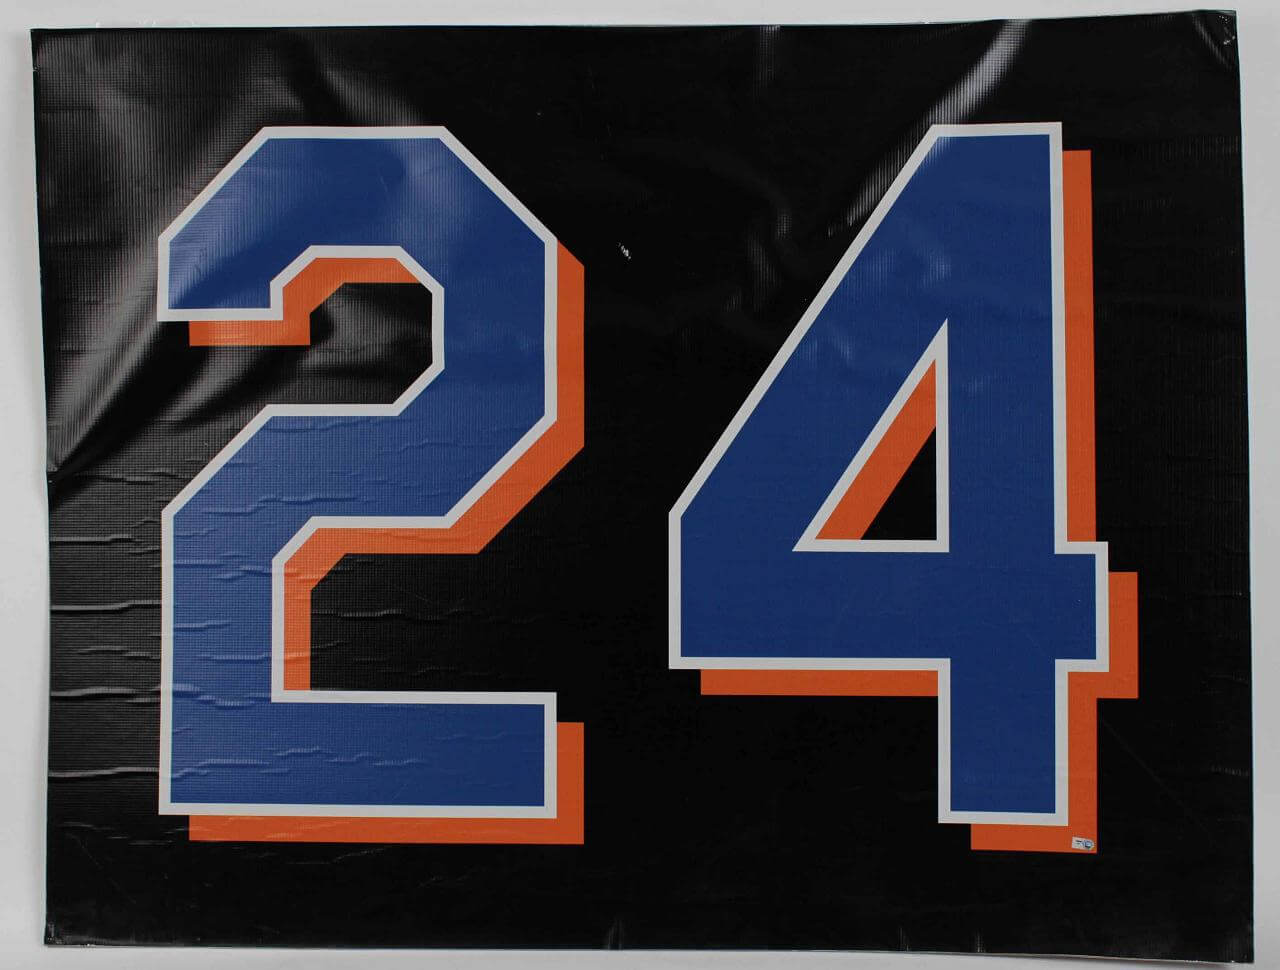 New York Mets Game Used 44x34 Vinyl Shea Stadium Game Countdown Sign Final Season (08/11/08) vs Pirates (Team Letter)